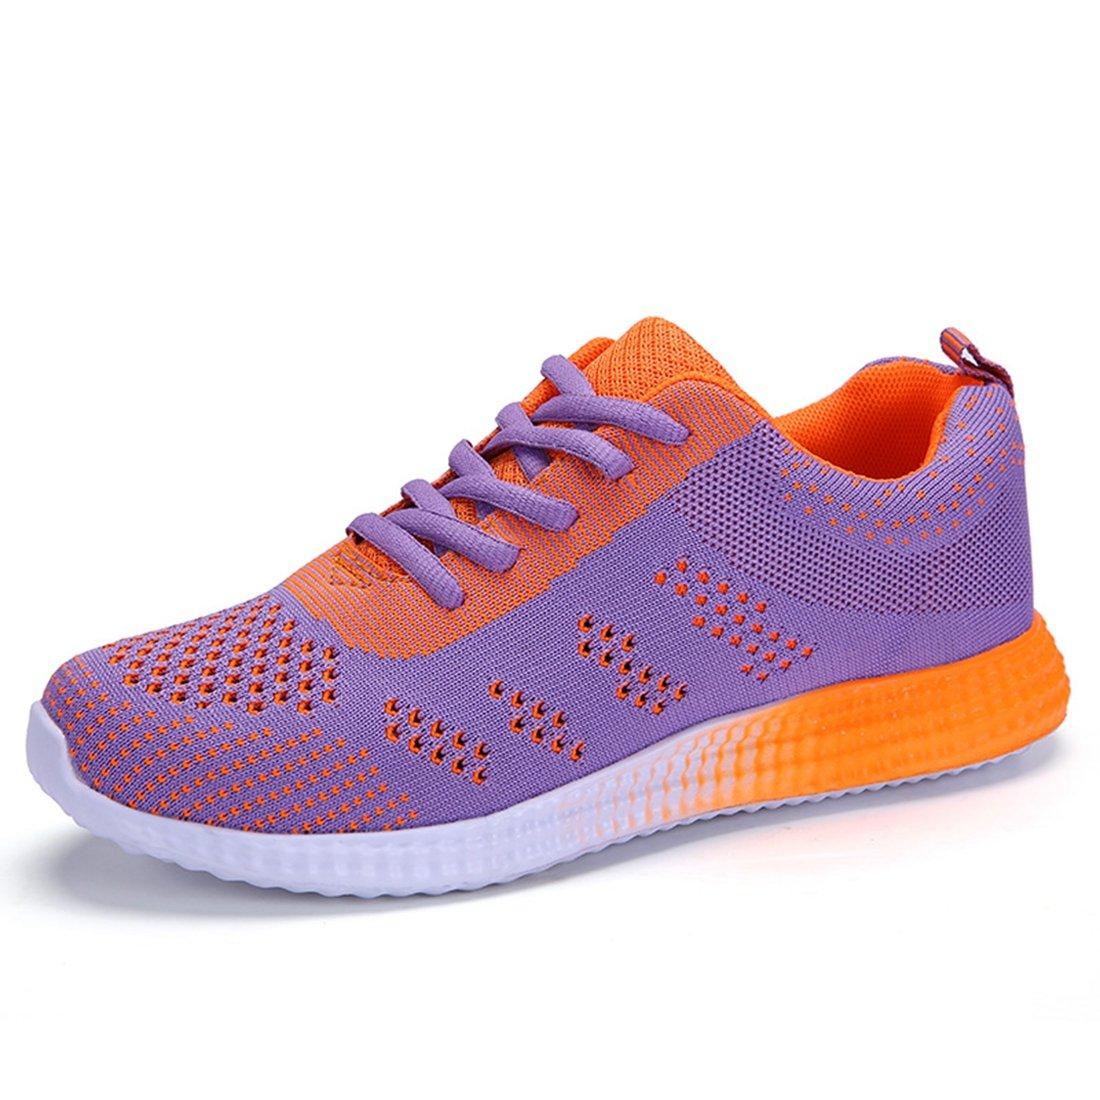 Women Aqua Water Shoes Quick Drying Lightweight Mesh Slip-on Athletic Sport Casual Sneakers Purple 245mm:8.5 B(M) US Women/6.5 D(M) US Men